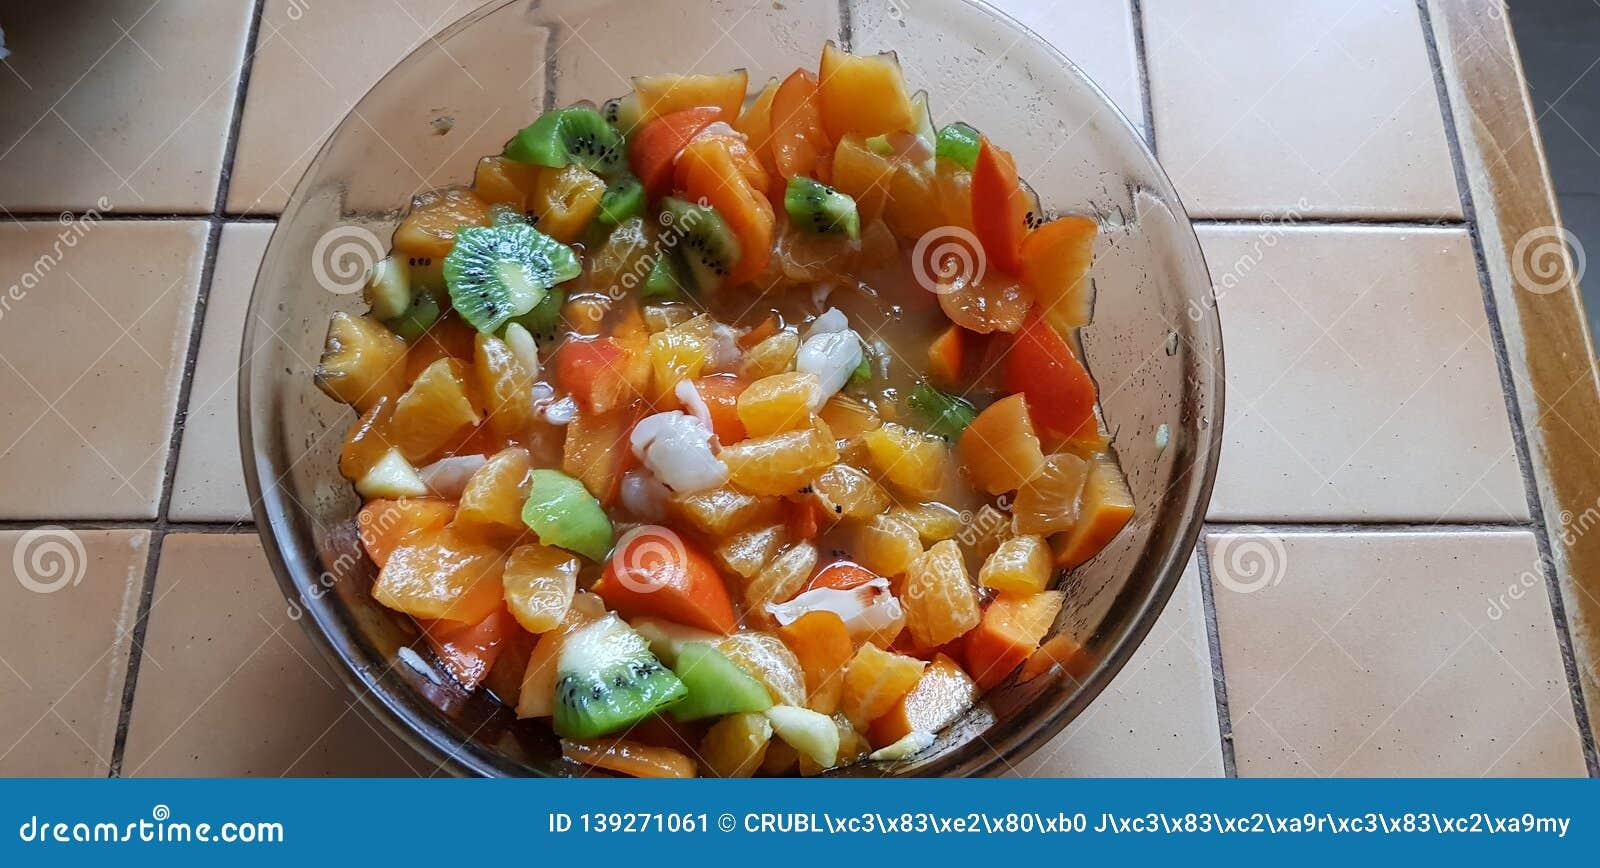 Salad Bowl Of Fresh Fruit Salad Stock Image Image Of Lychee Bowl 139271061